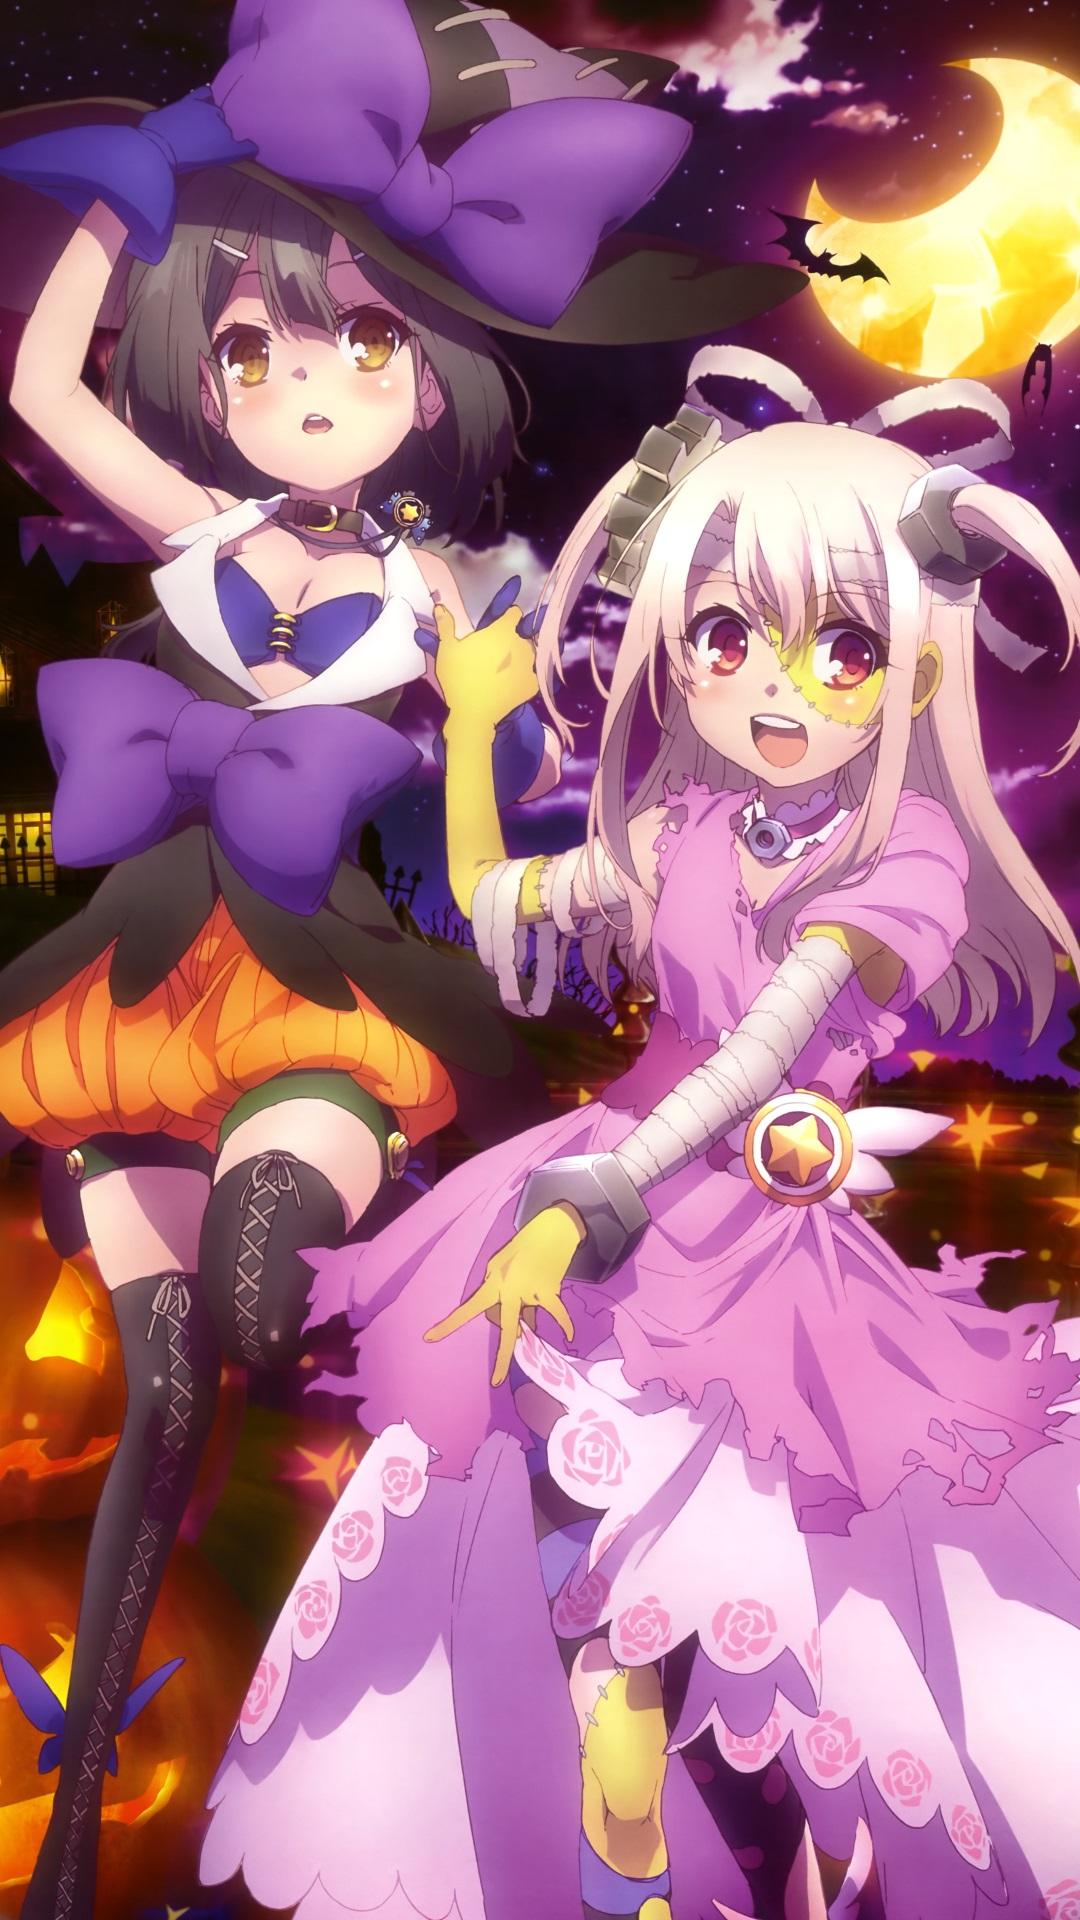 Halloween 2014 Anime Fate Kaleid Illya Iphone 6 Plus Wallpaper